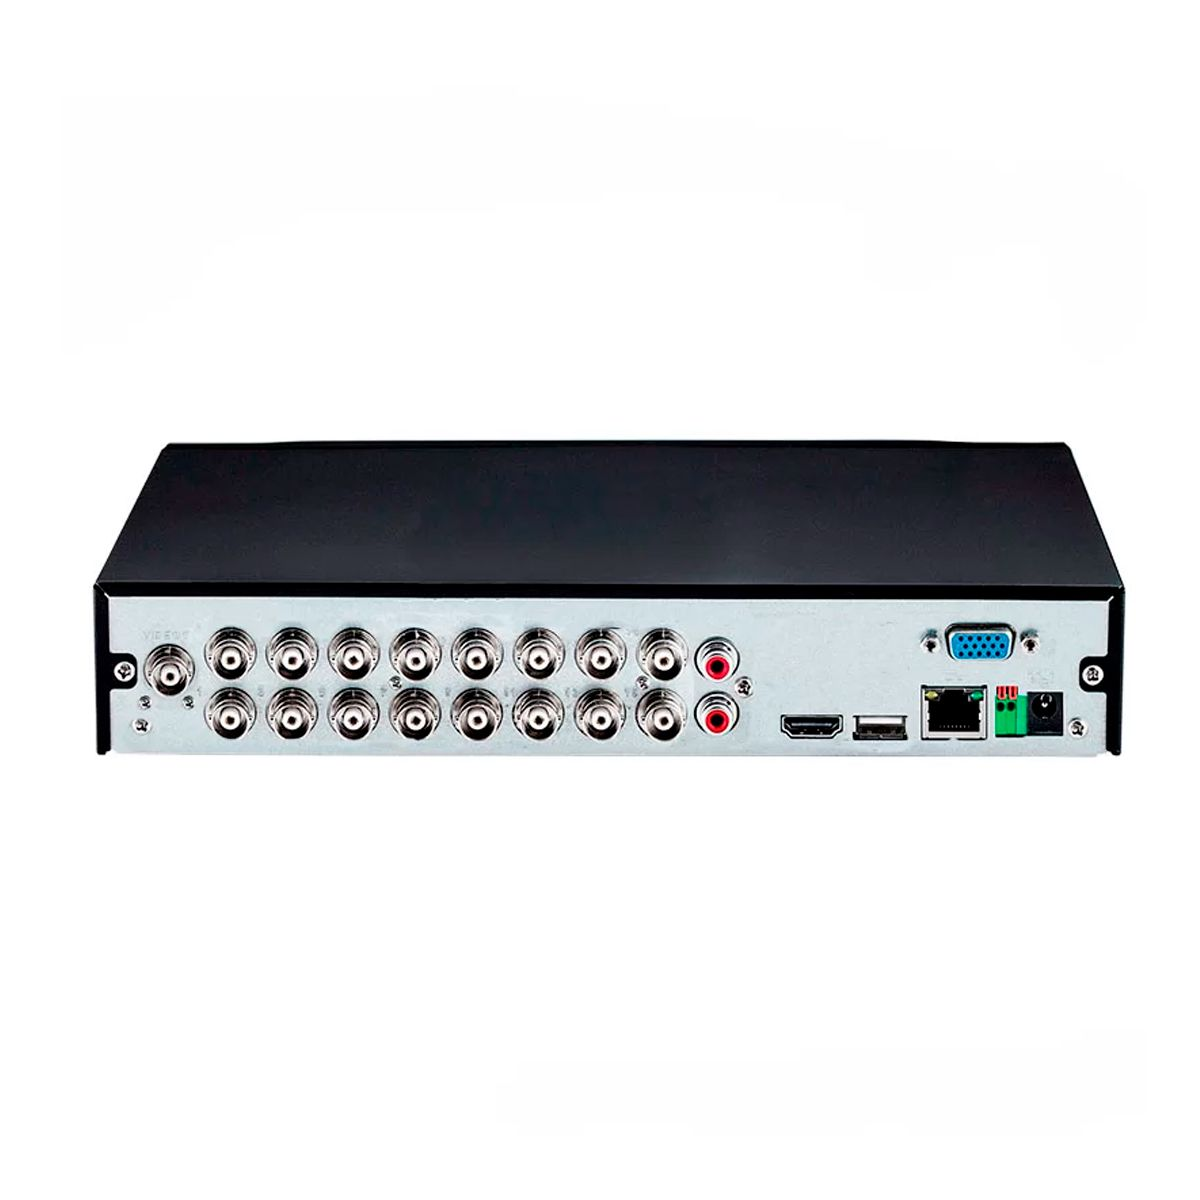 Kit 16 Câmeras VHD 3120 B G5 + DVR Intelbras + App Grátis, HD 720p 20m Infravermelho + Cabos e Acessórios  - Tudo Forte